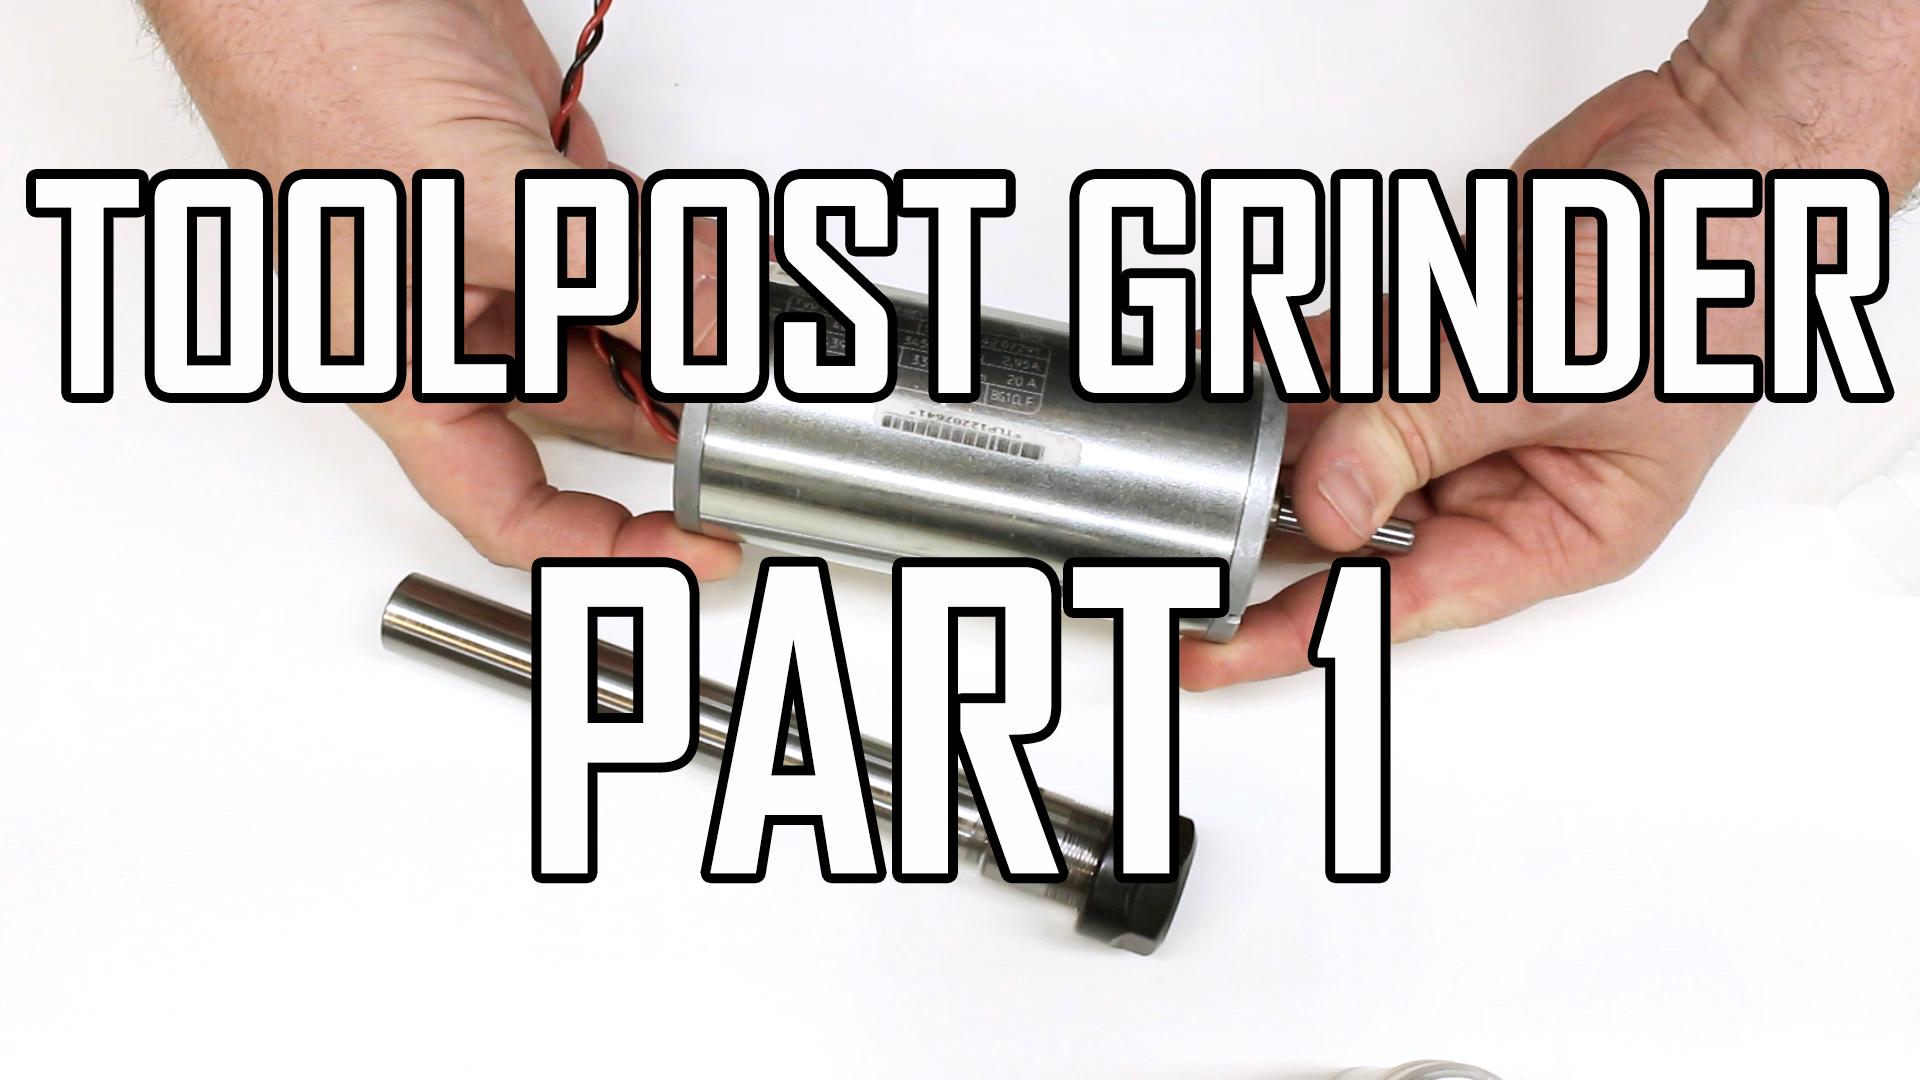 Toolpost Grinder Build Part 1: Introduction